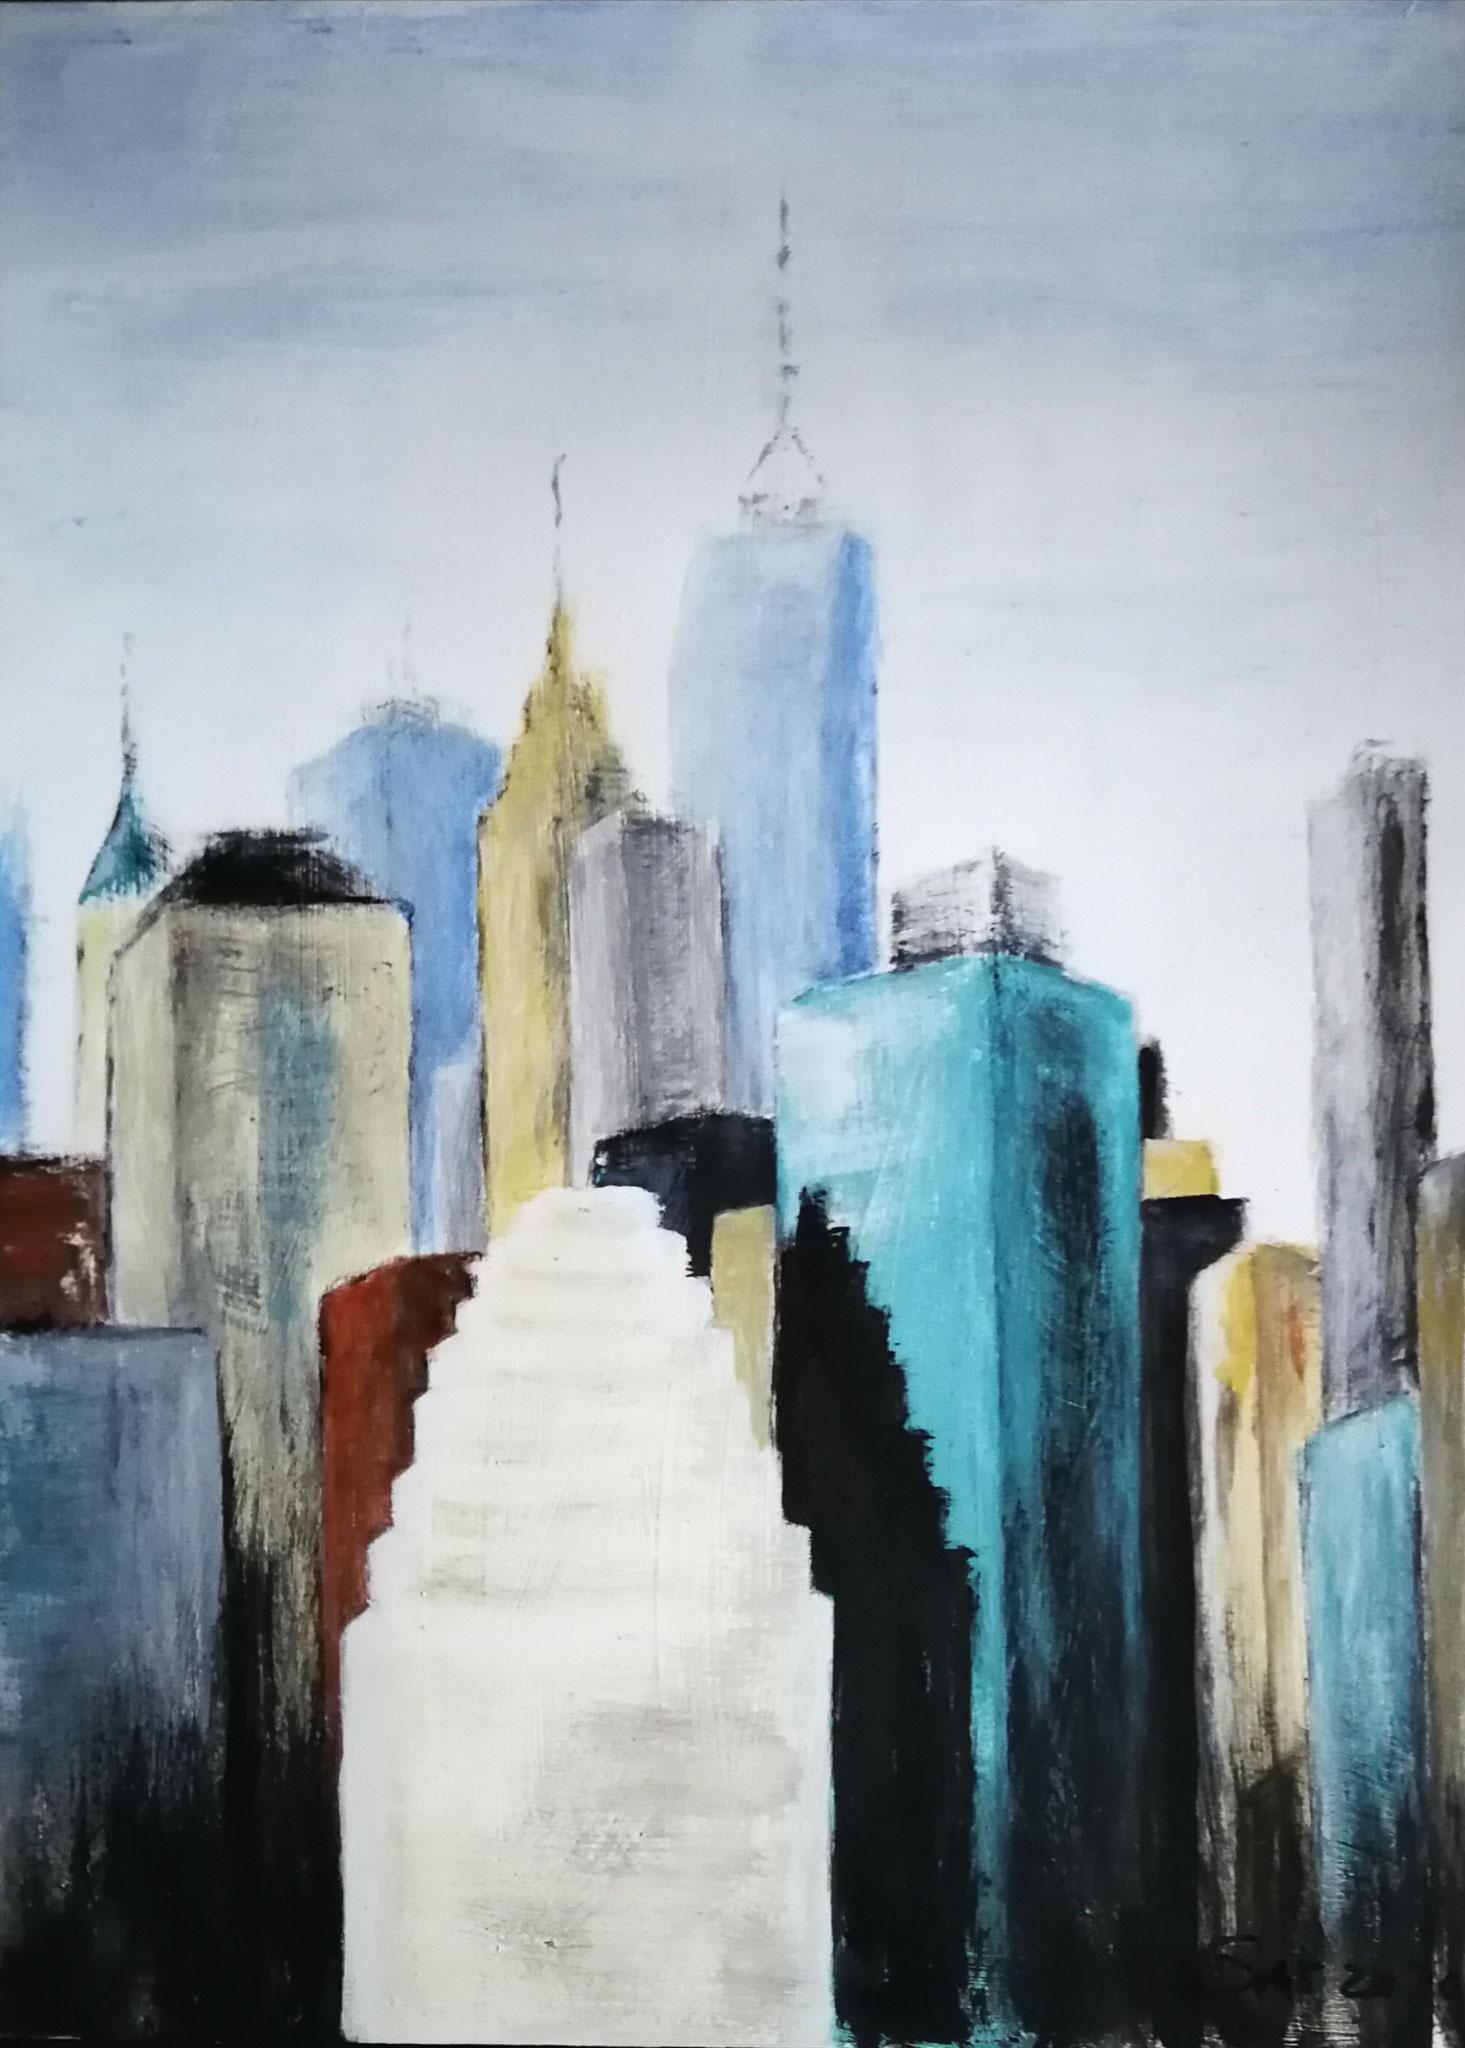 Turmbau zu NY, Acryl auf Papier 48x64. Sigrid Müller-Stahl